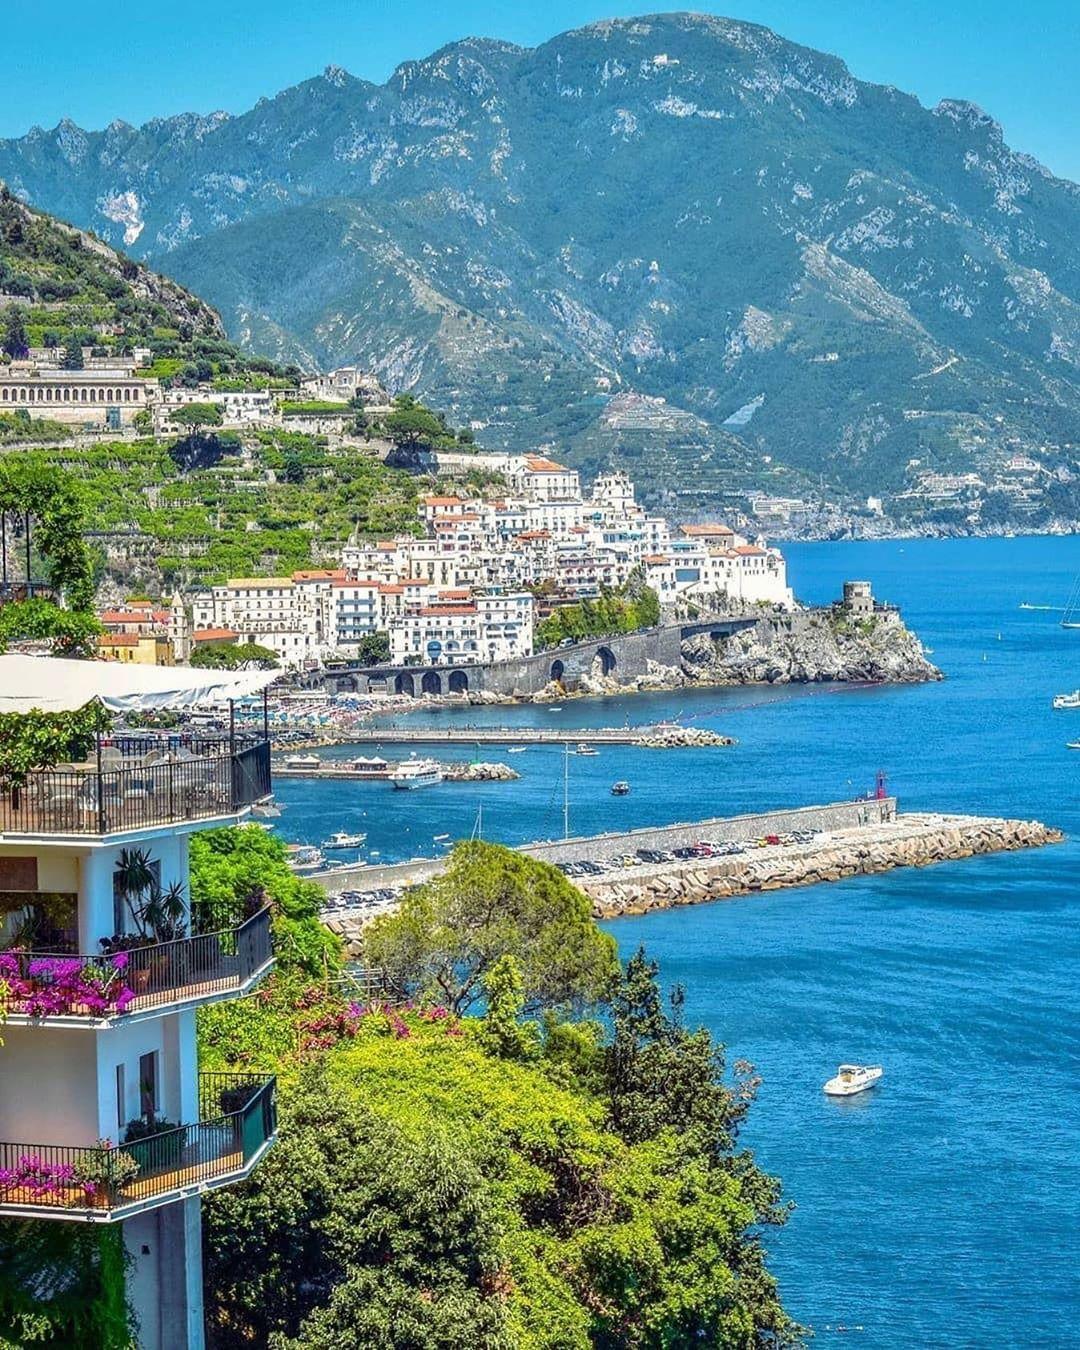 Amalfi Coast Italy S Instagram Profile Post Superb Views Over Amalfi Don T Miss The Opportunity To Enter The Win A Vacation Amalfi Coast Amalfi Coast Italy